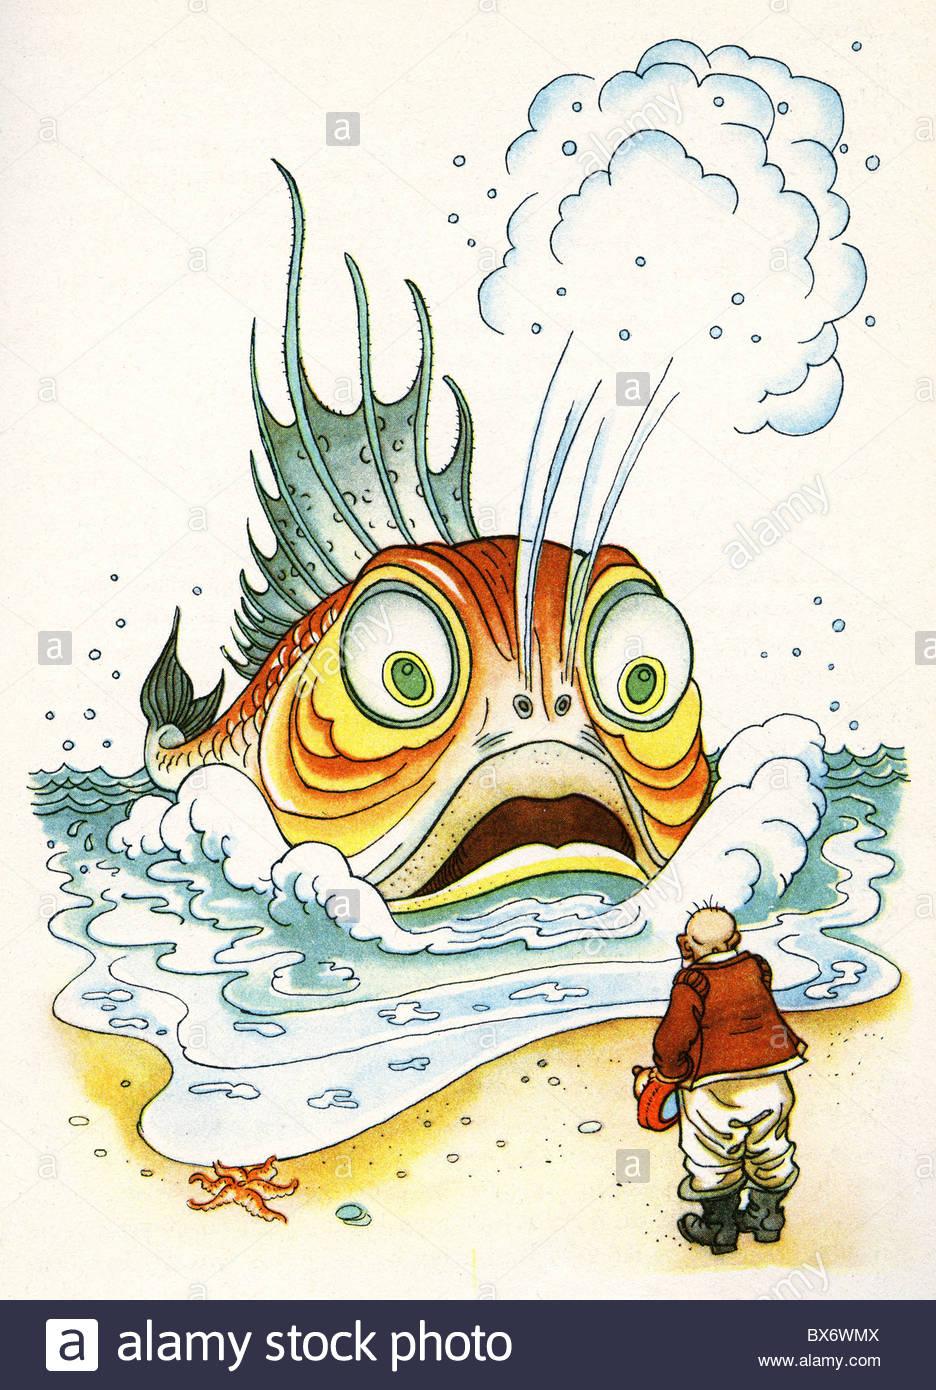 936x1390 Literature, Fairy Tale, Grimm's Fairy Tales, The Fisherman